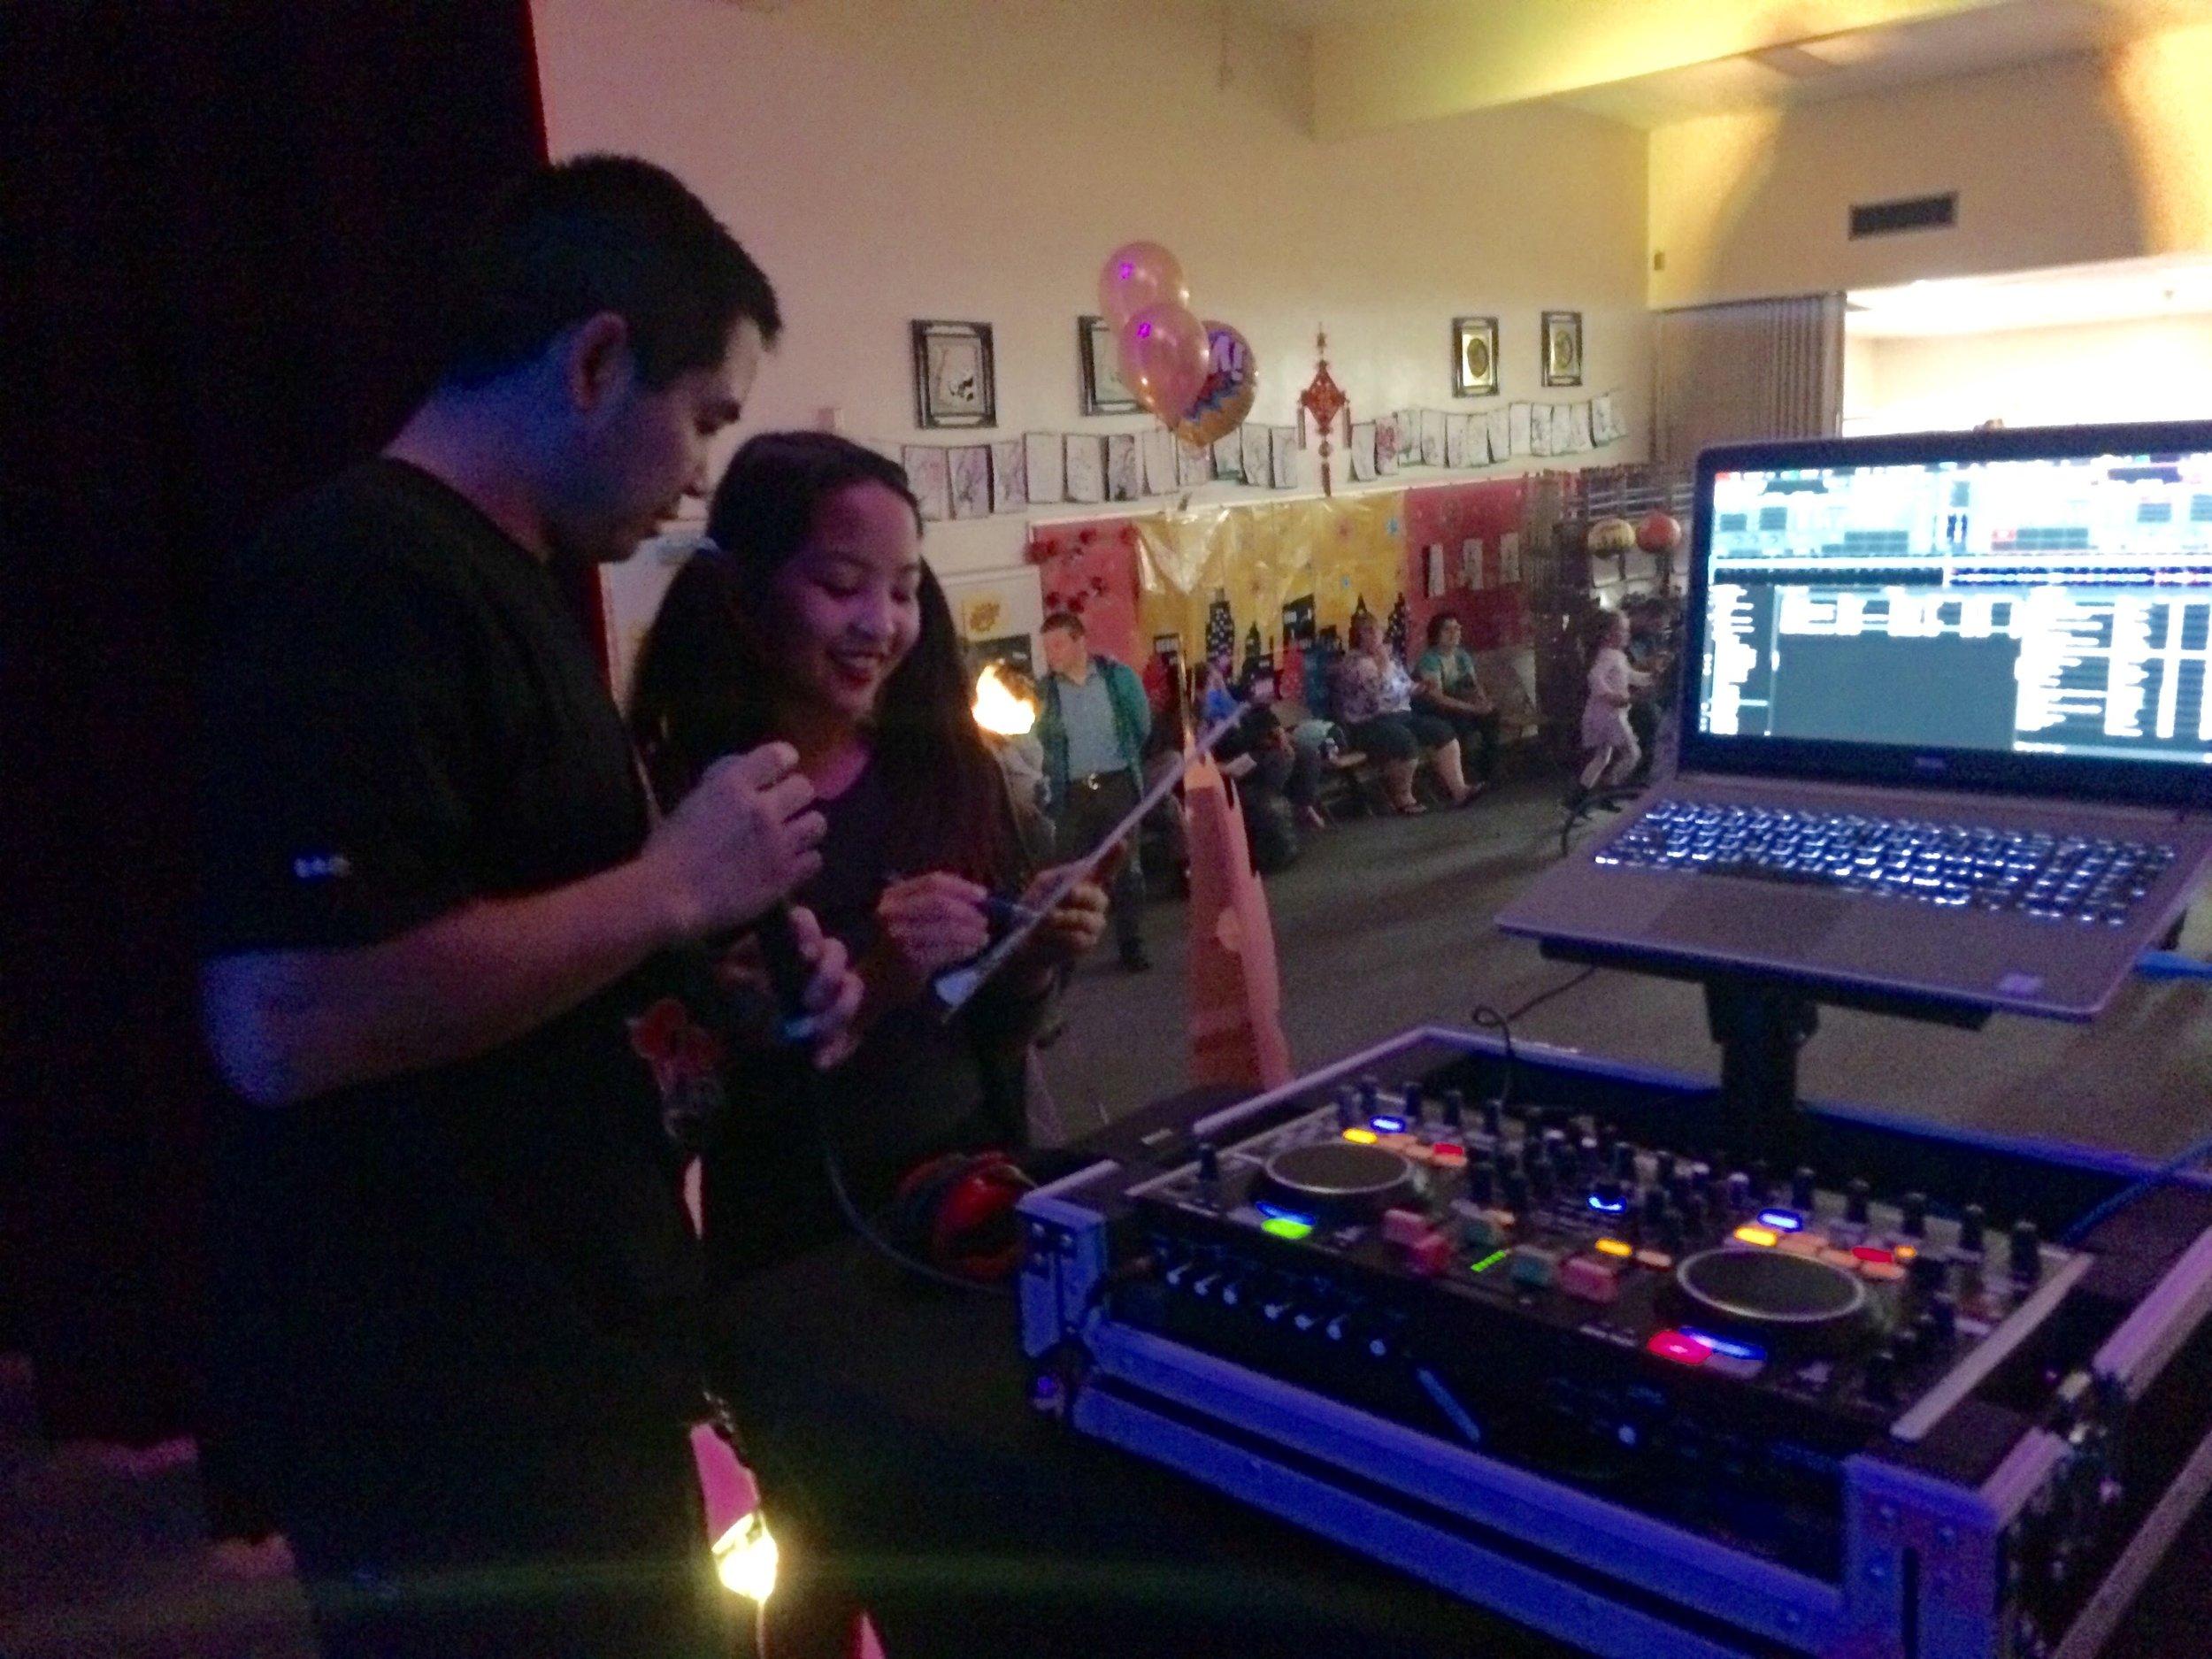 San Diego Diego, Justin Kanoya, DJ's the Barnard Elementary School dance with some help from daughter, Marissa.